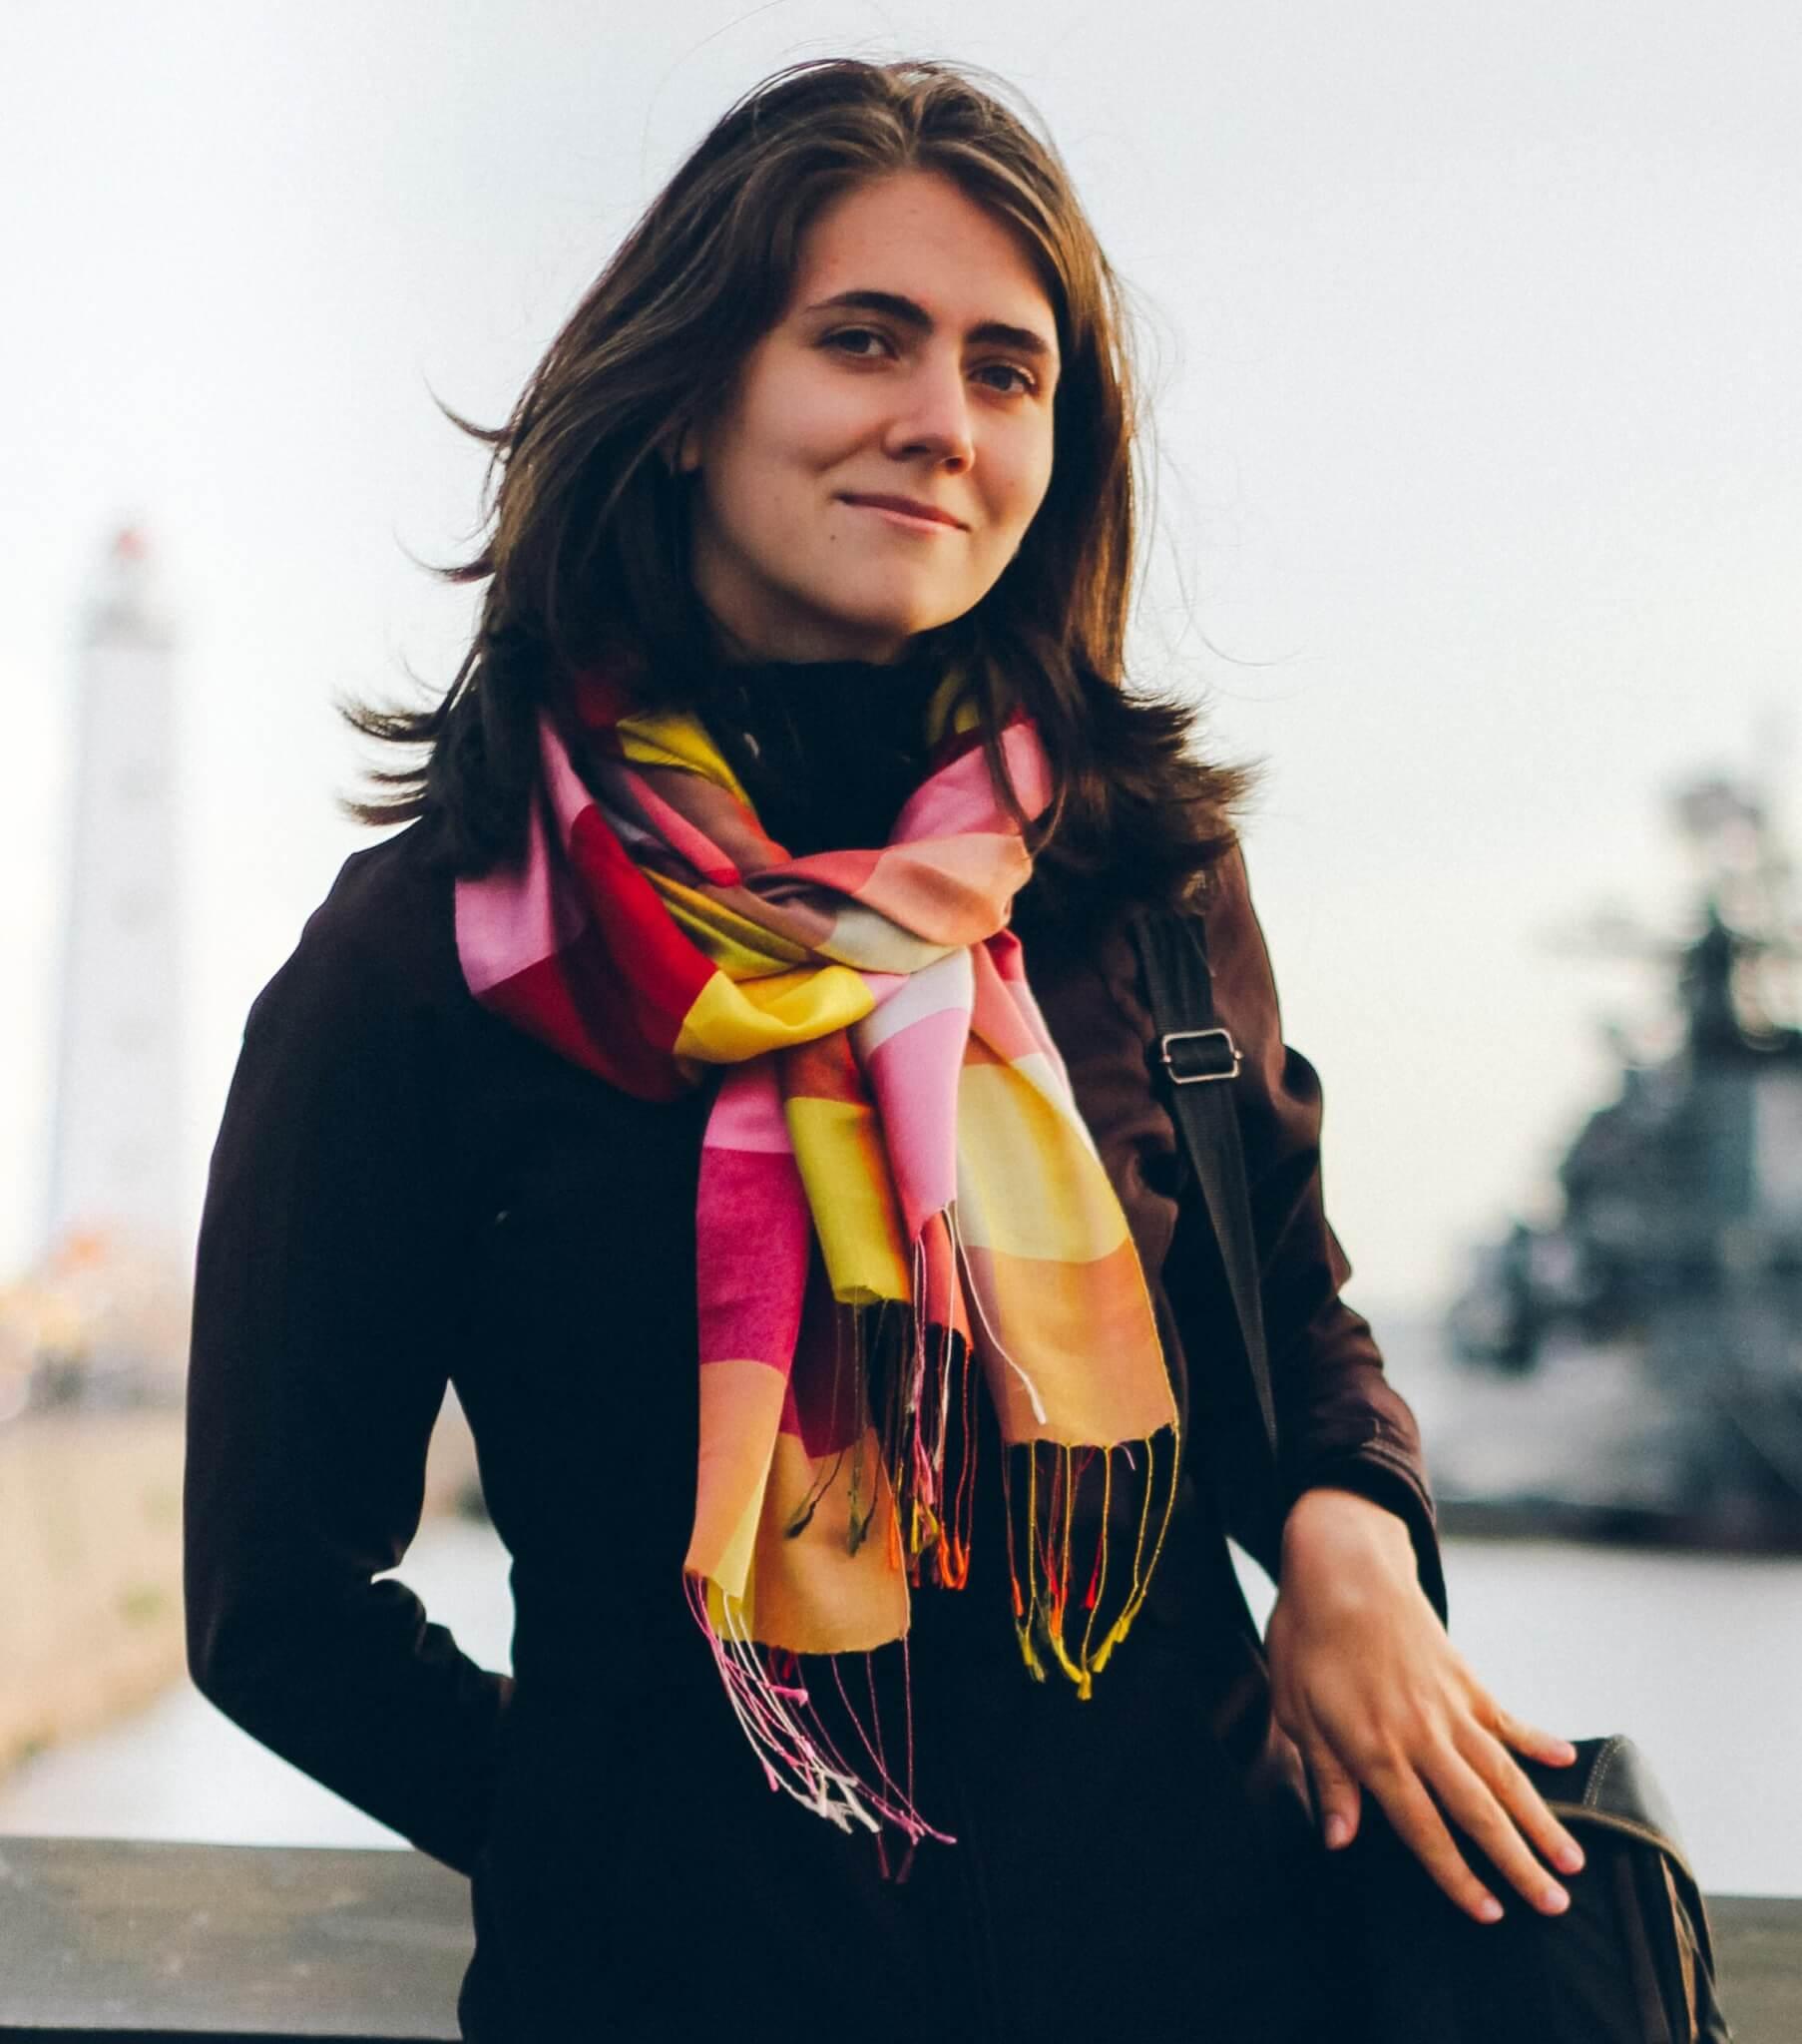 Анастасия Вагнер